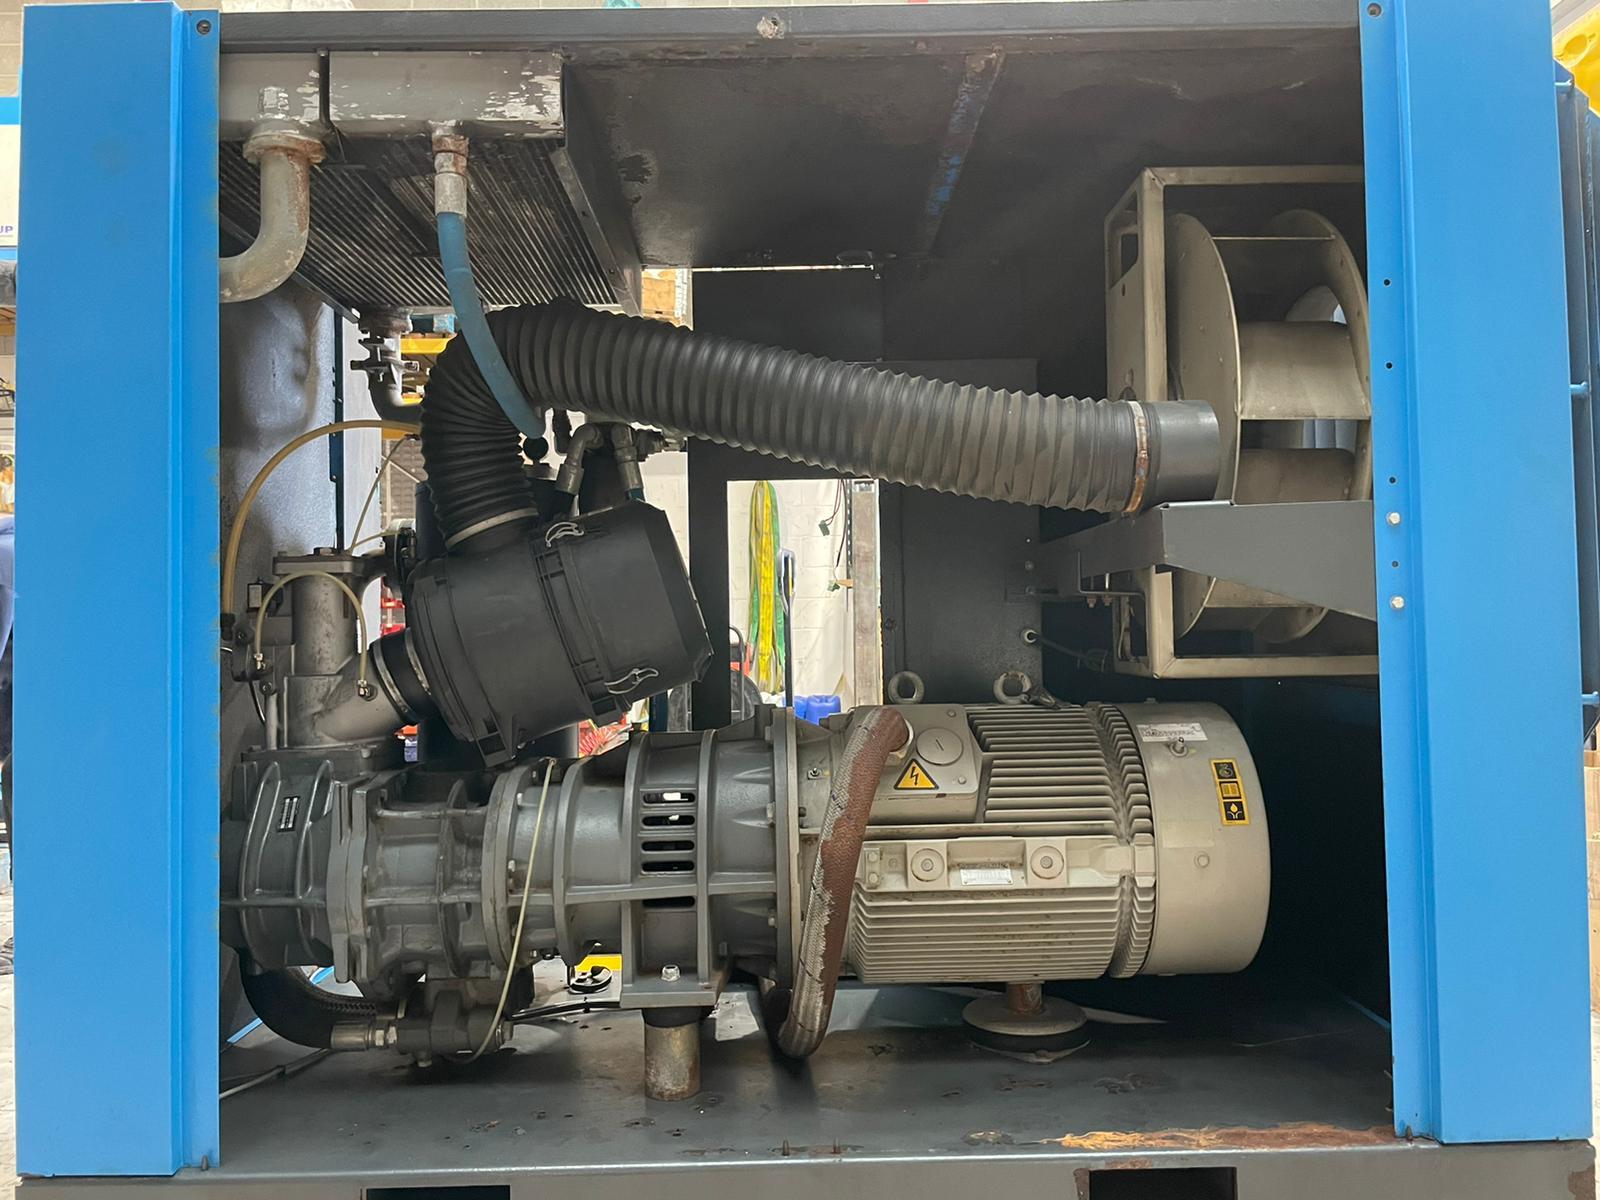 Worthington RLR 80V 55kw Variable Speed Screw Compressor 2011